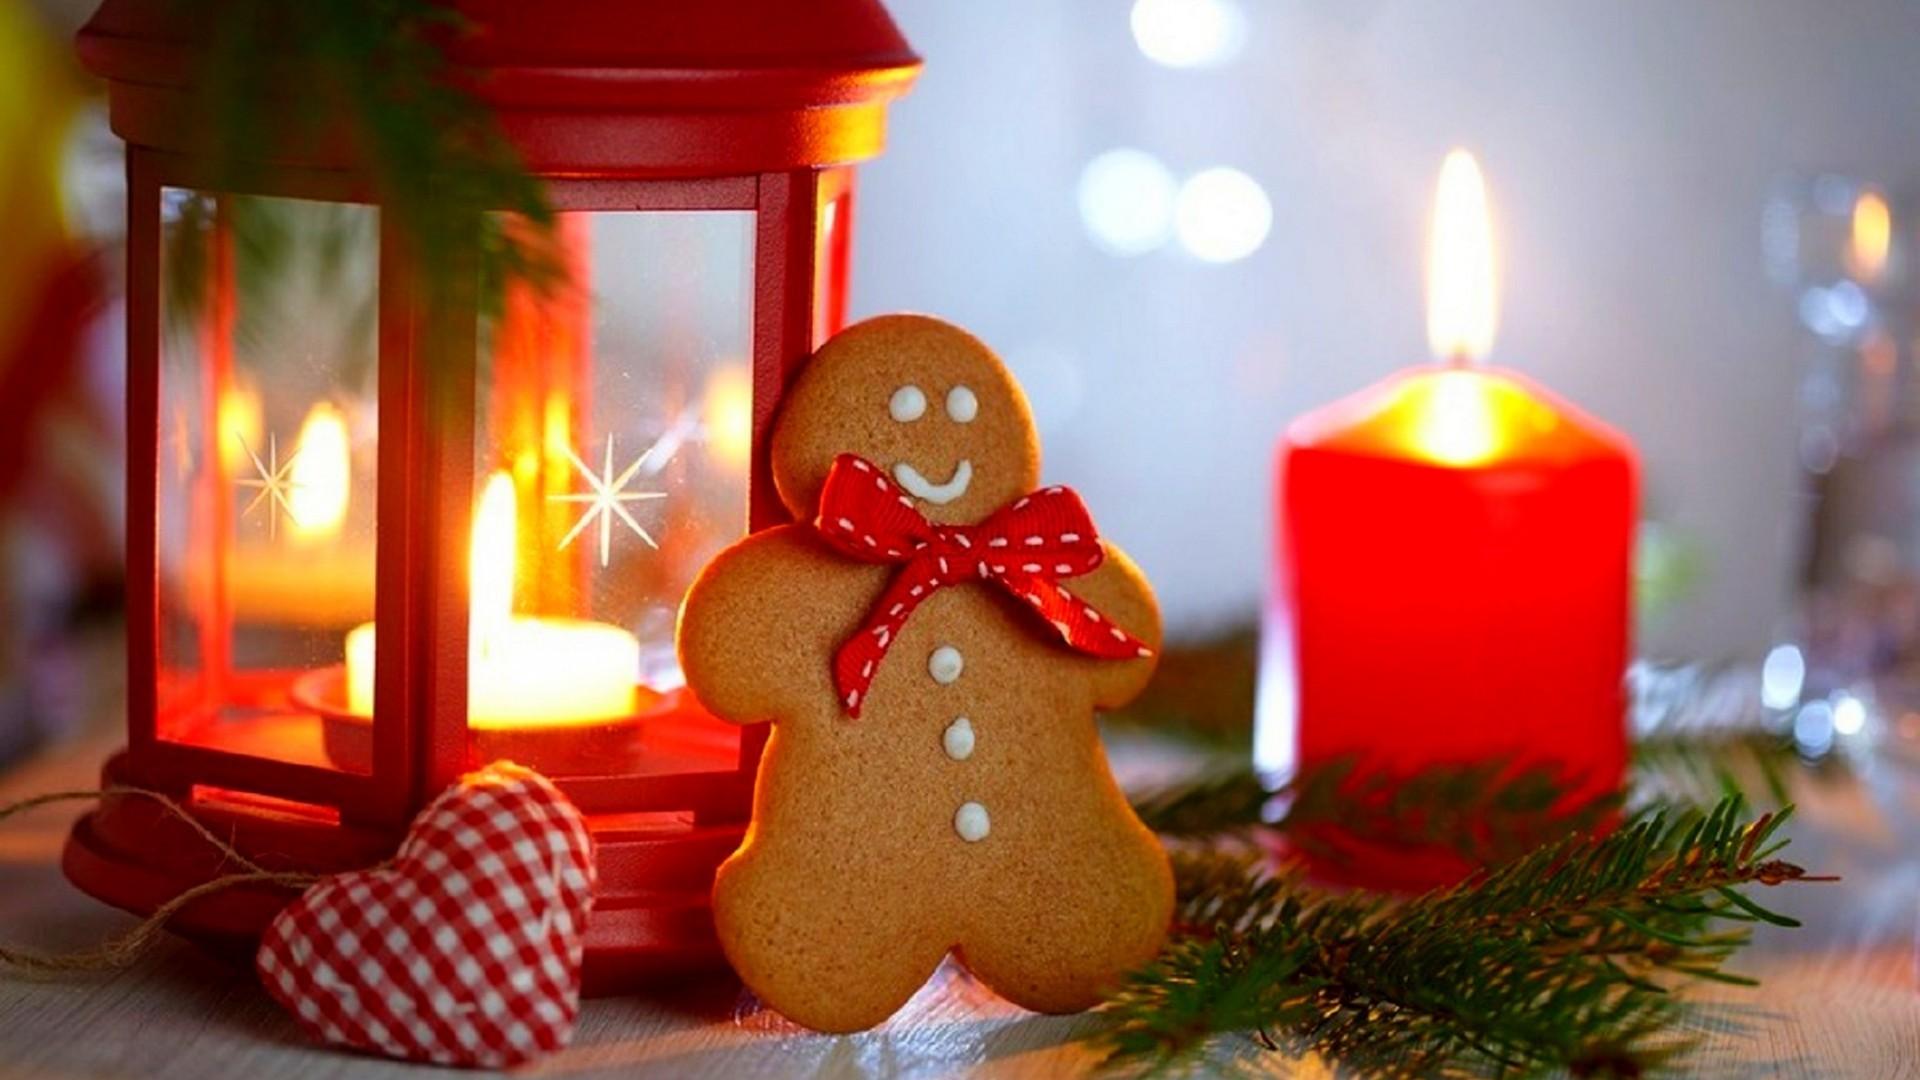 Fond d 39 cran aliments c ur rouge lanterne bougies for Sfondi natalizi 1920x1080